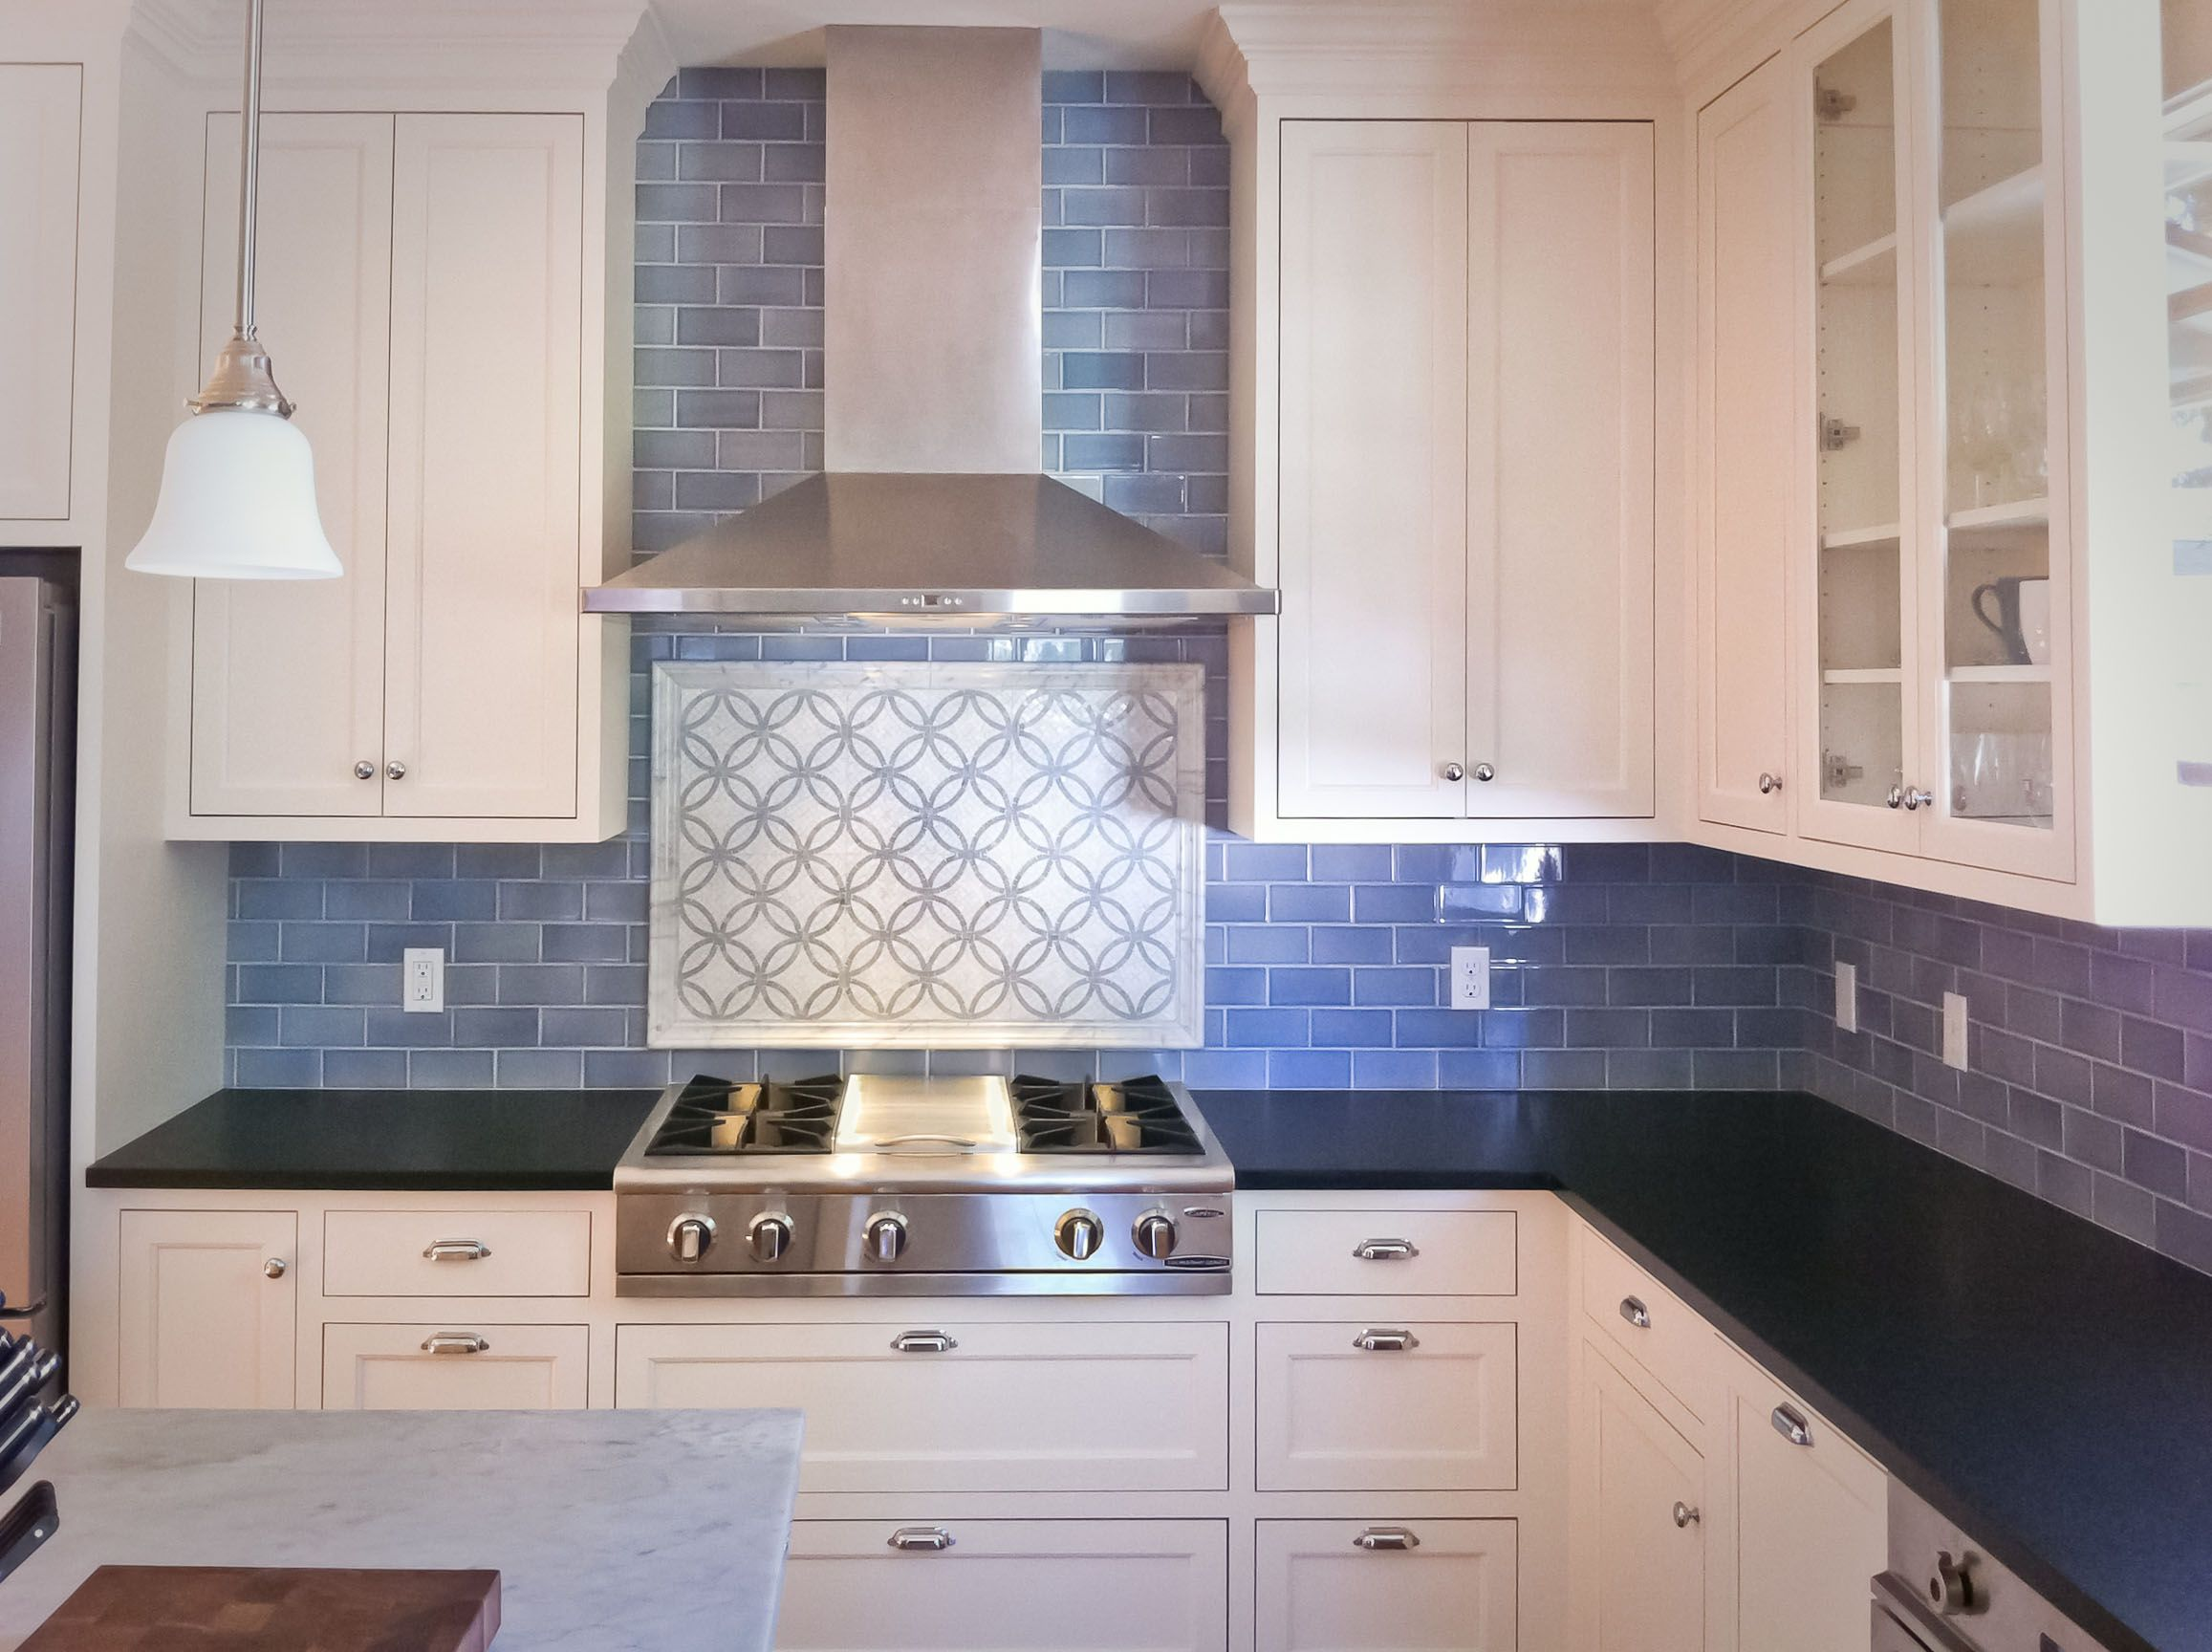 - 38+ Fine Tiles Decor Modern Kitchen Tiles, Patterned Kitchen